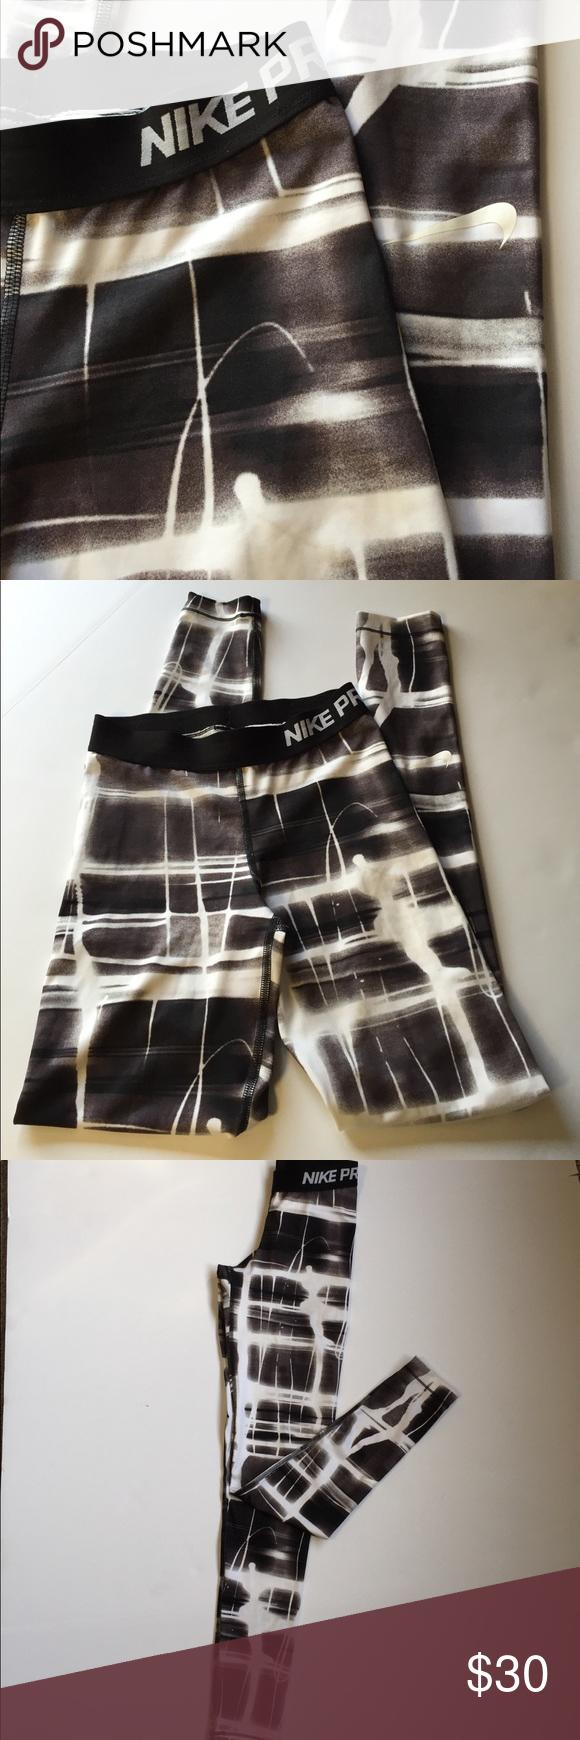 NIKE PRO Athletic Pants NIKE PRO Athletic Pants  -  80% polyester 20% spandex - fun black & white print - ankle length - size XS Nike Pants Track Pants & Joggers